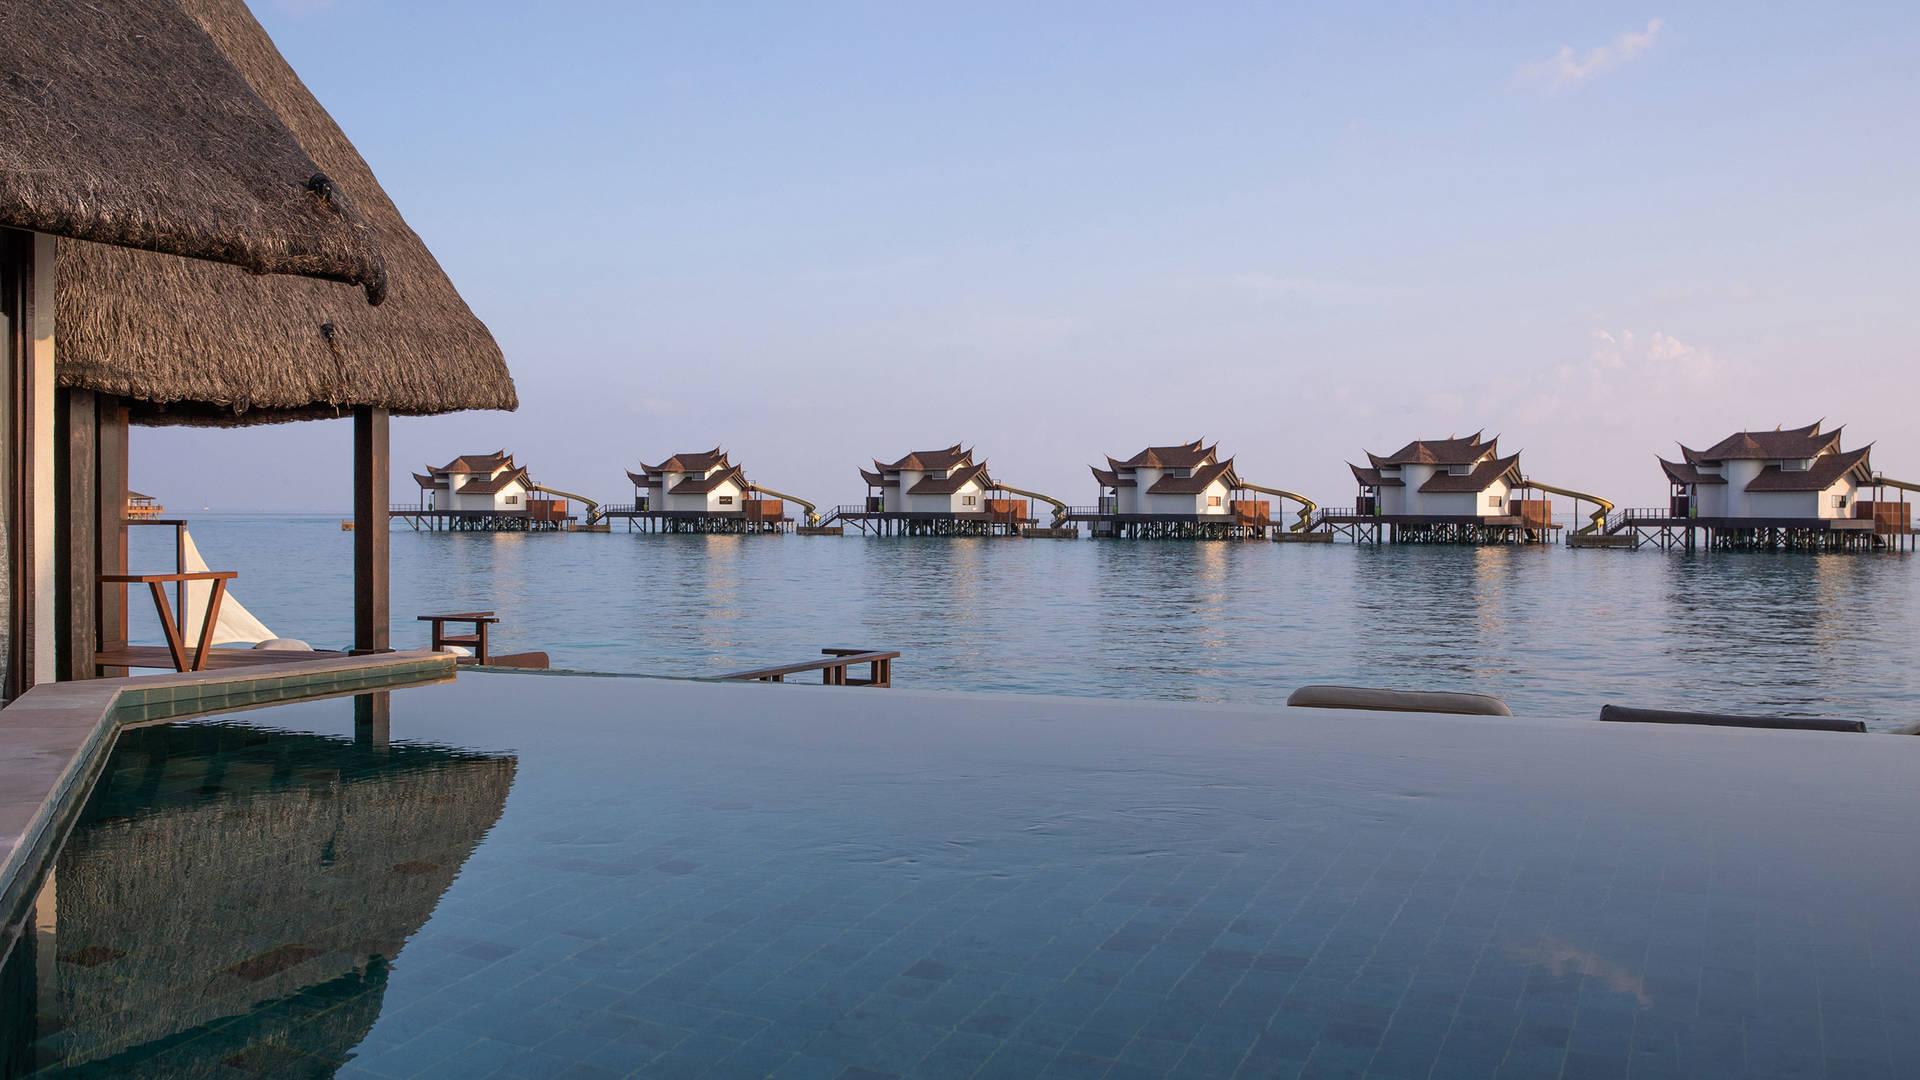 View at the Jumeirah Vittaveli hotel